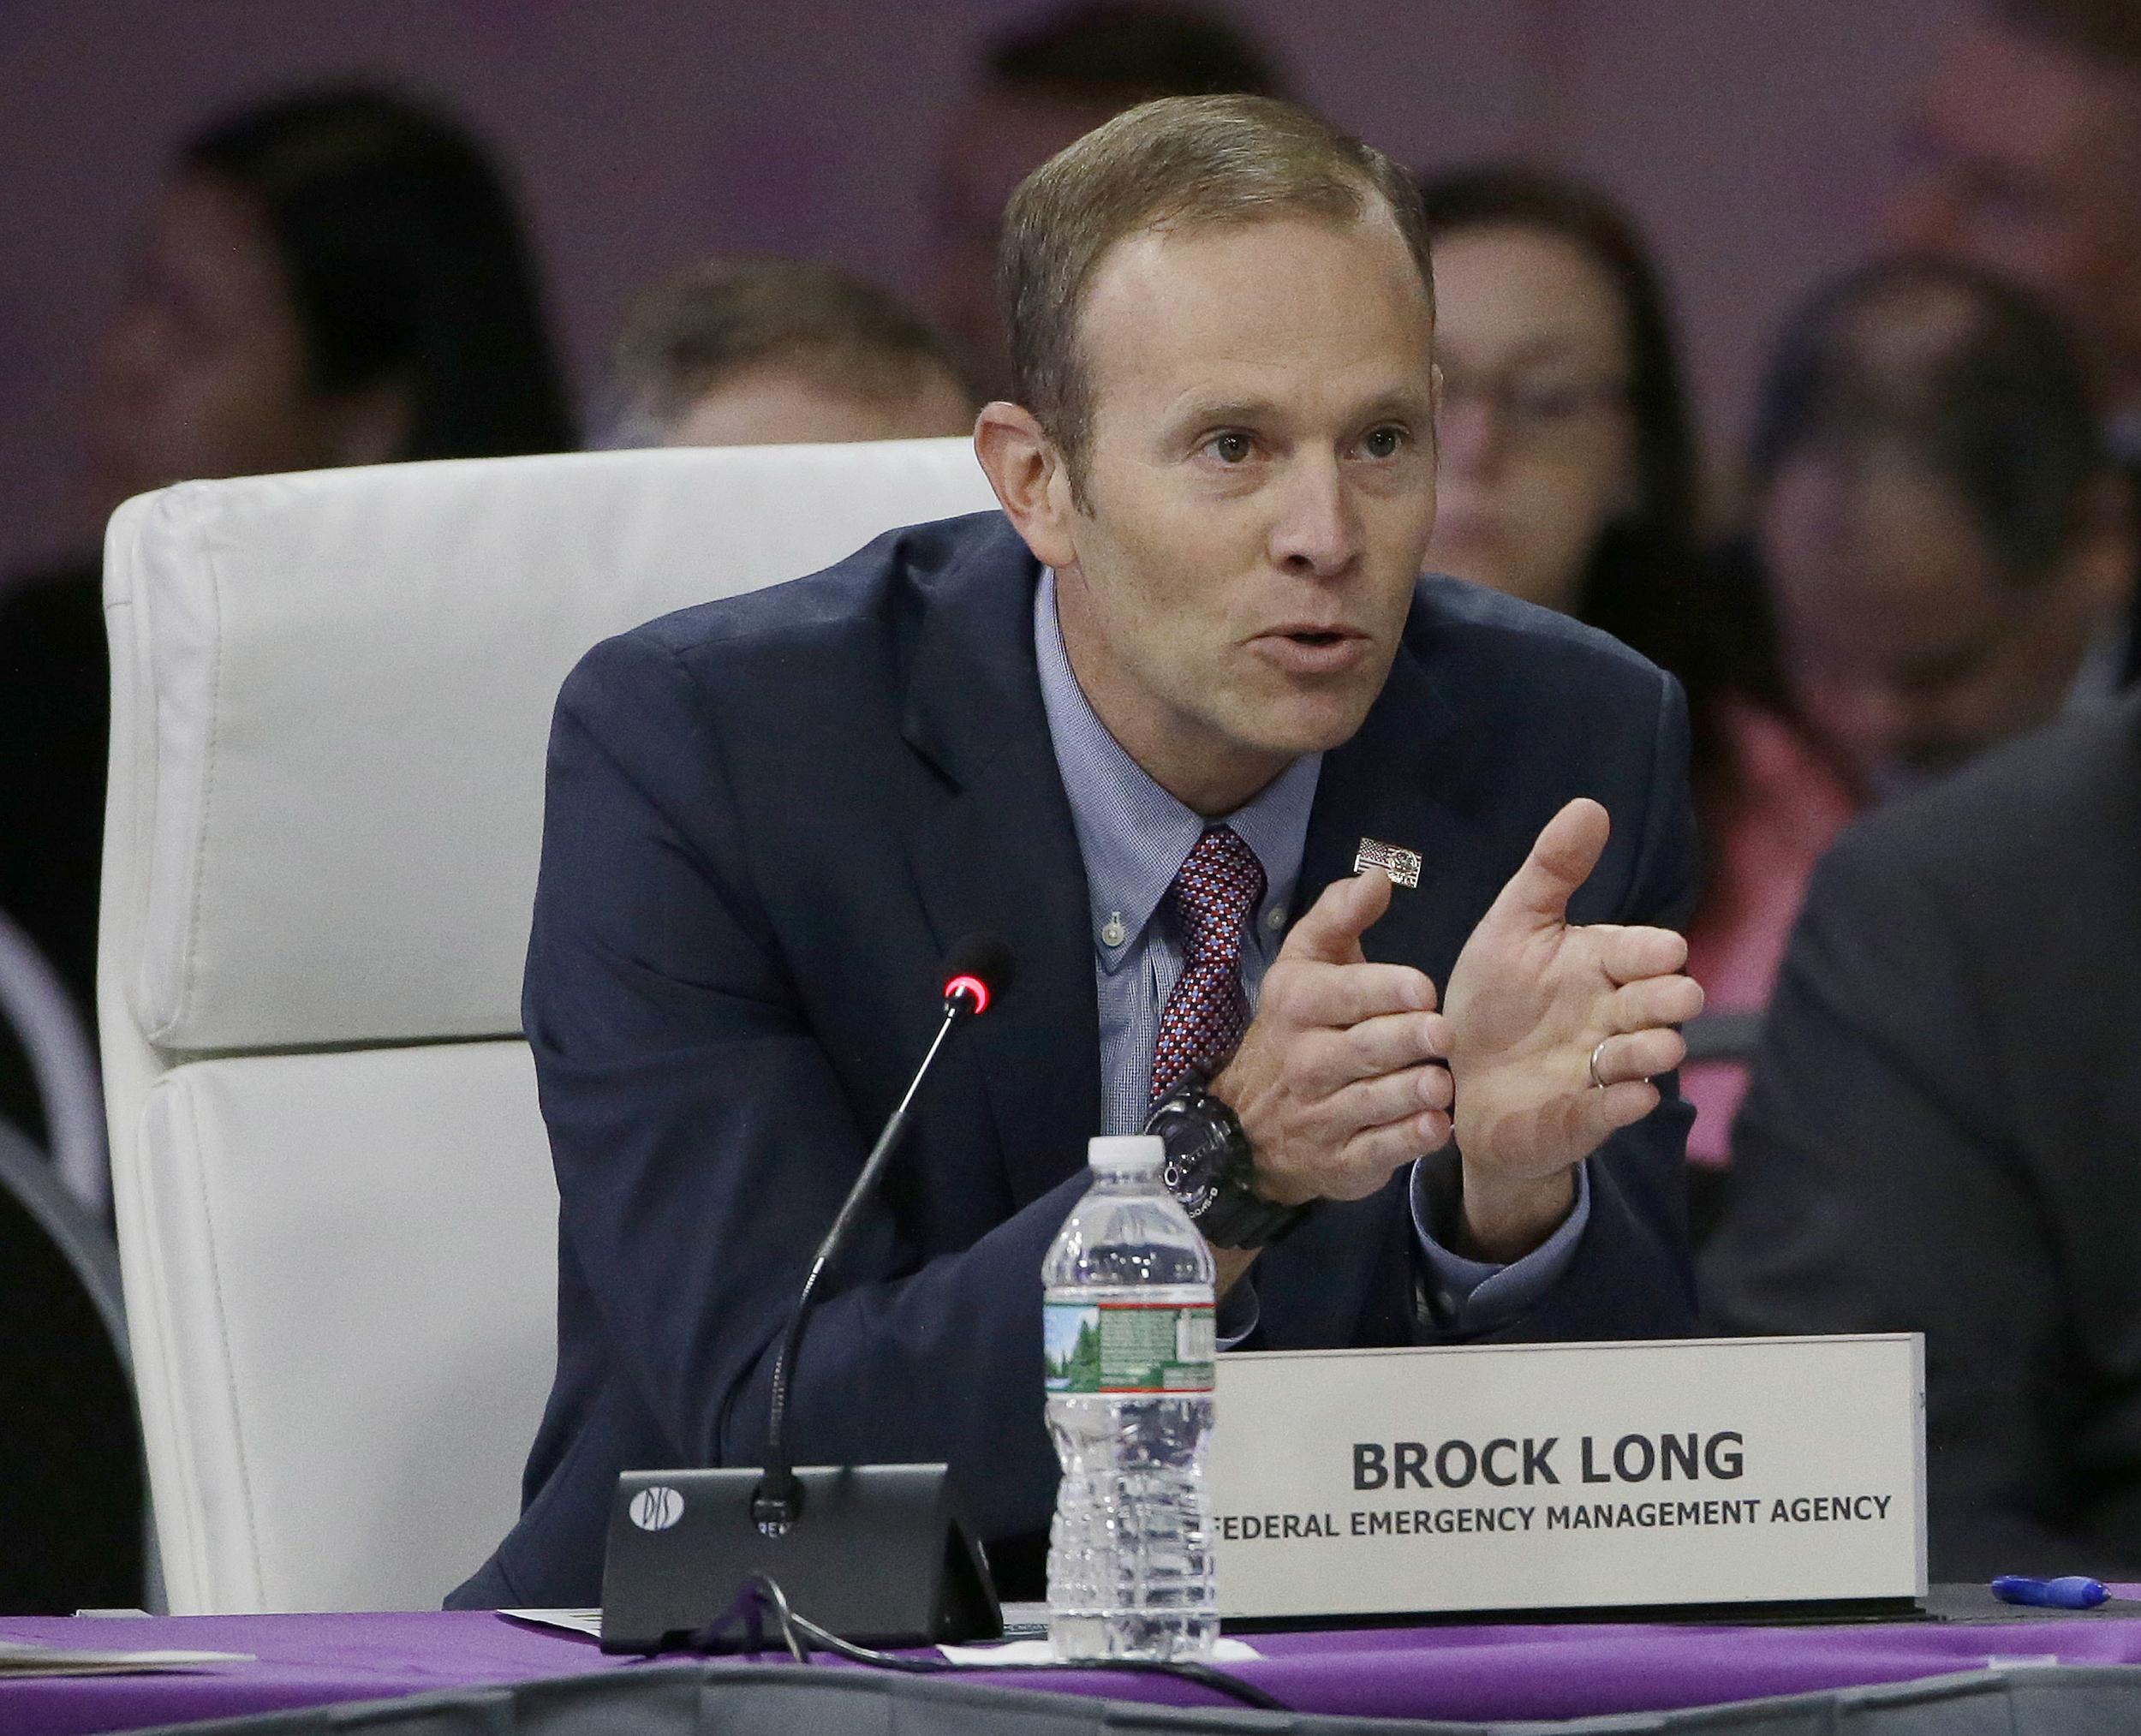 Image: FEMA Director Brock Long addresses a plenary session entitled